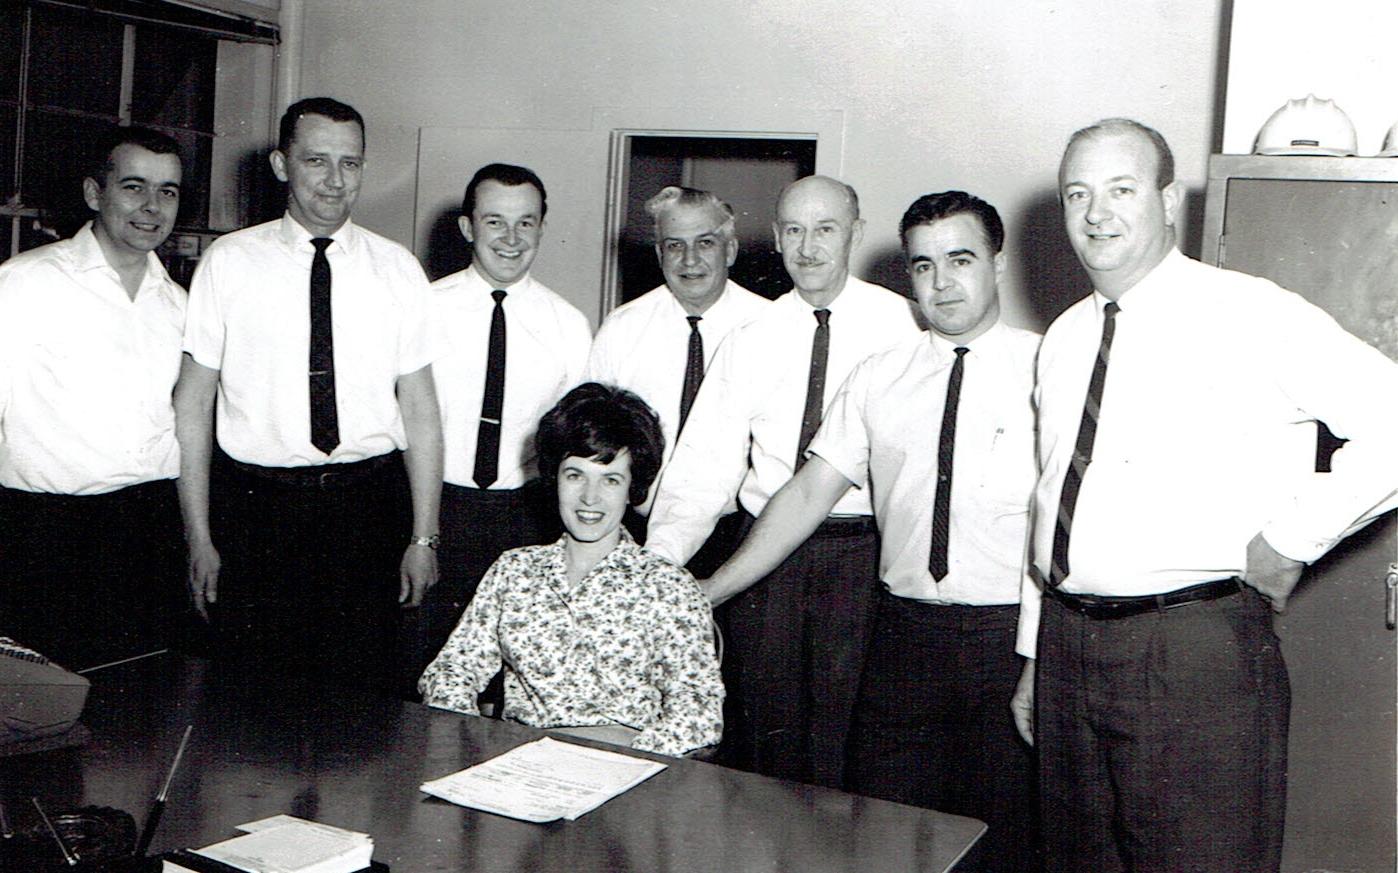 1968 Accounting staff: Ron Henry, Ray Smith, Gary Kelly, Chrlie Bingham, Alex FrASER, tOM bROOKS, tOM hANLEY, UNKNOWN